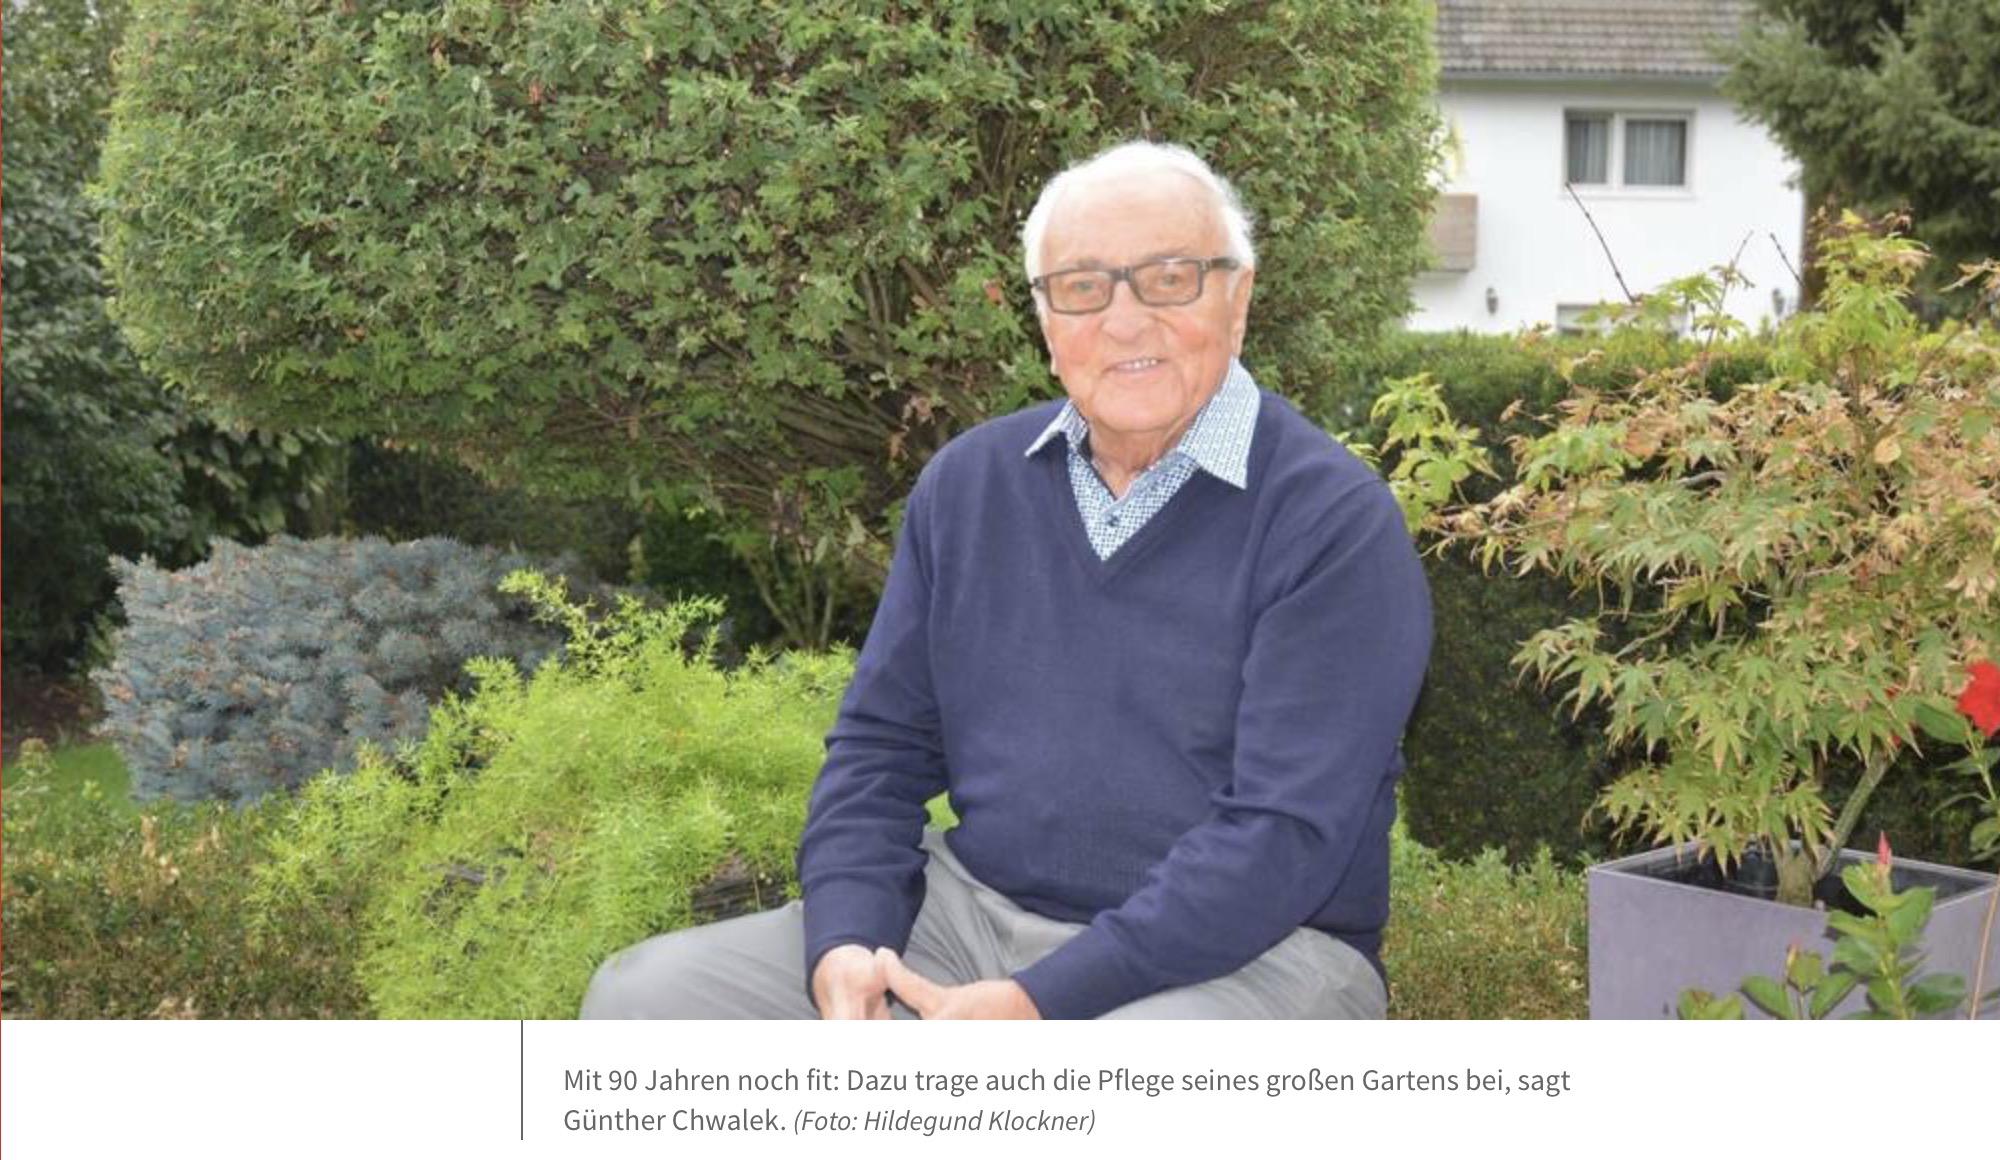 CDU Flörsheim am Main gratuliert Günther Chwalek zum 90. Geburtstag